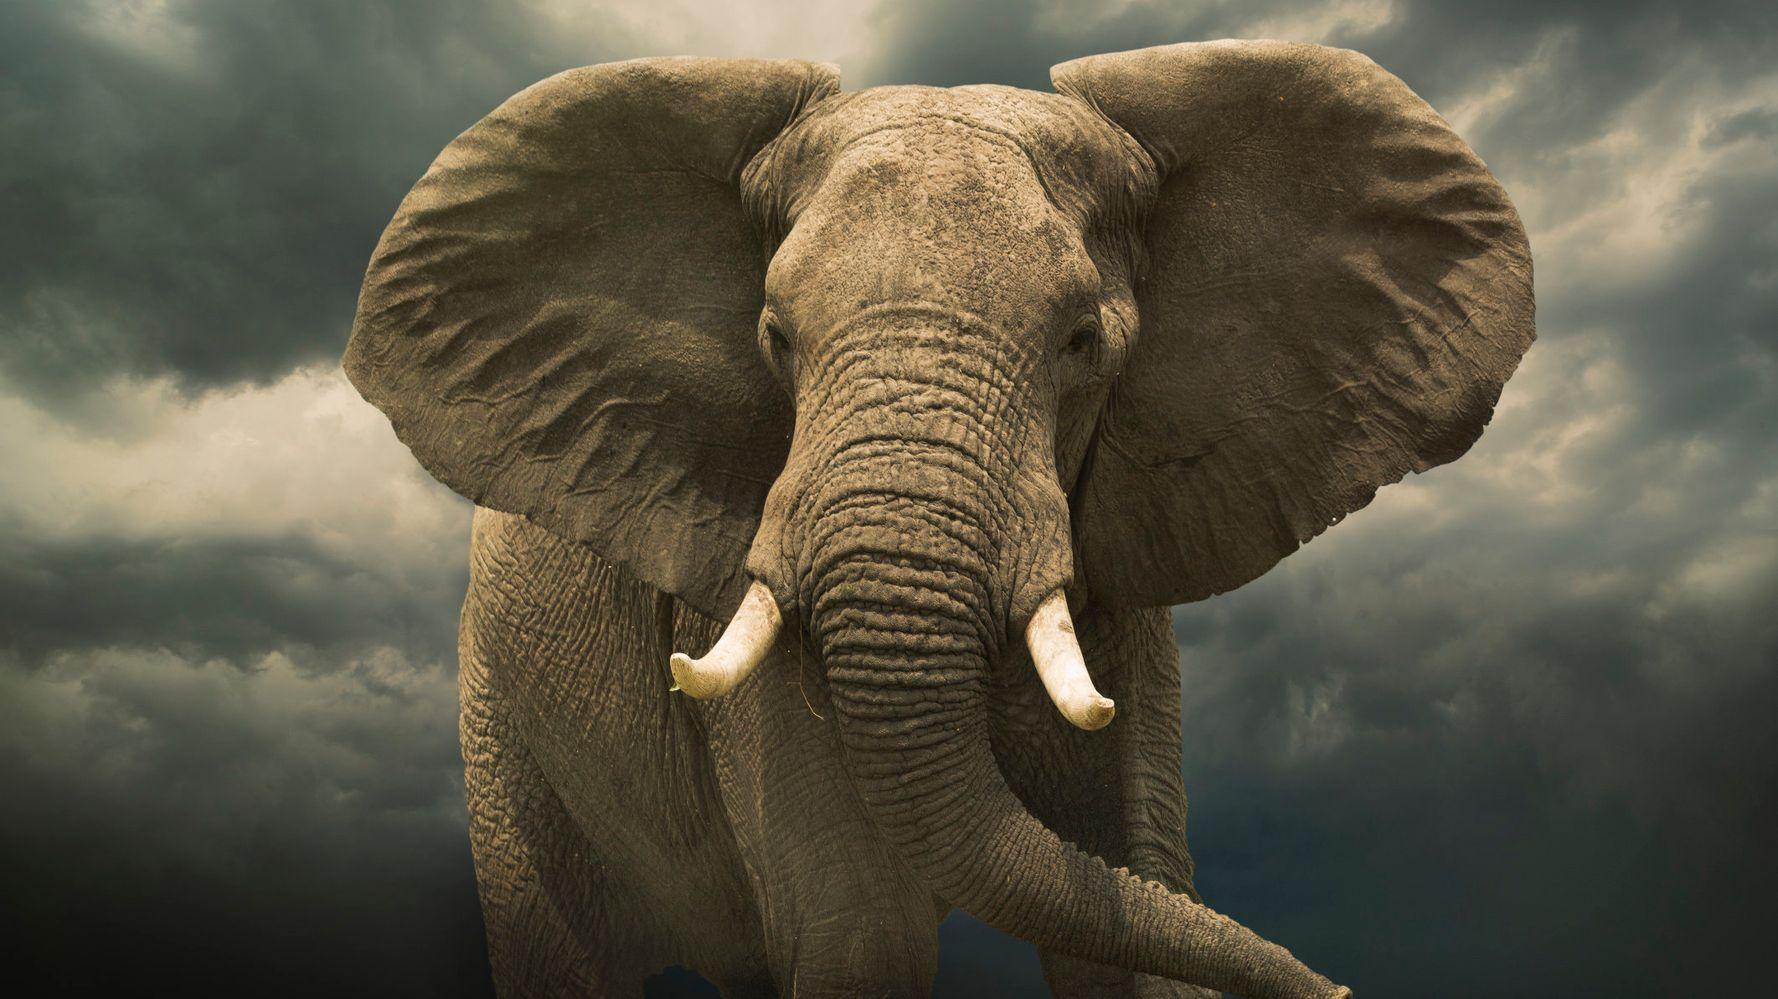 Elephant dick